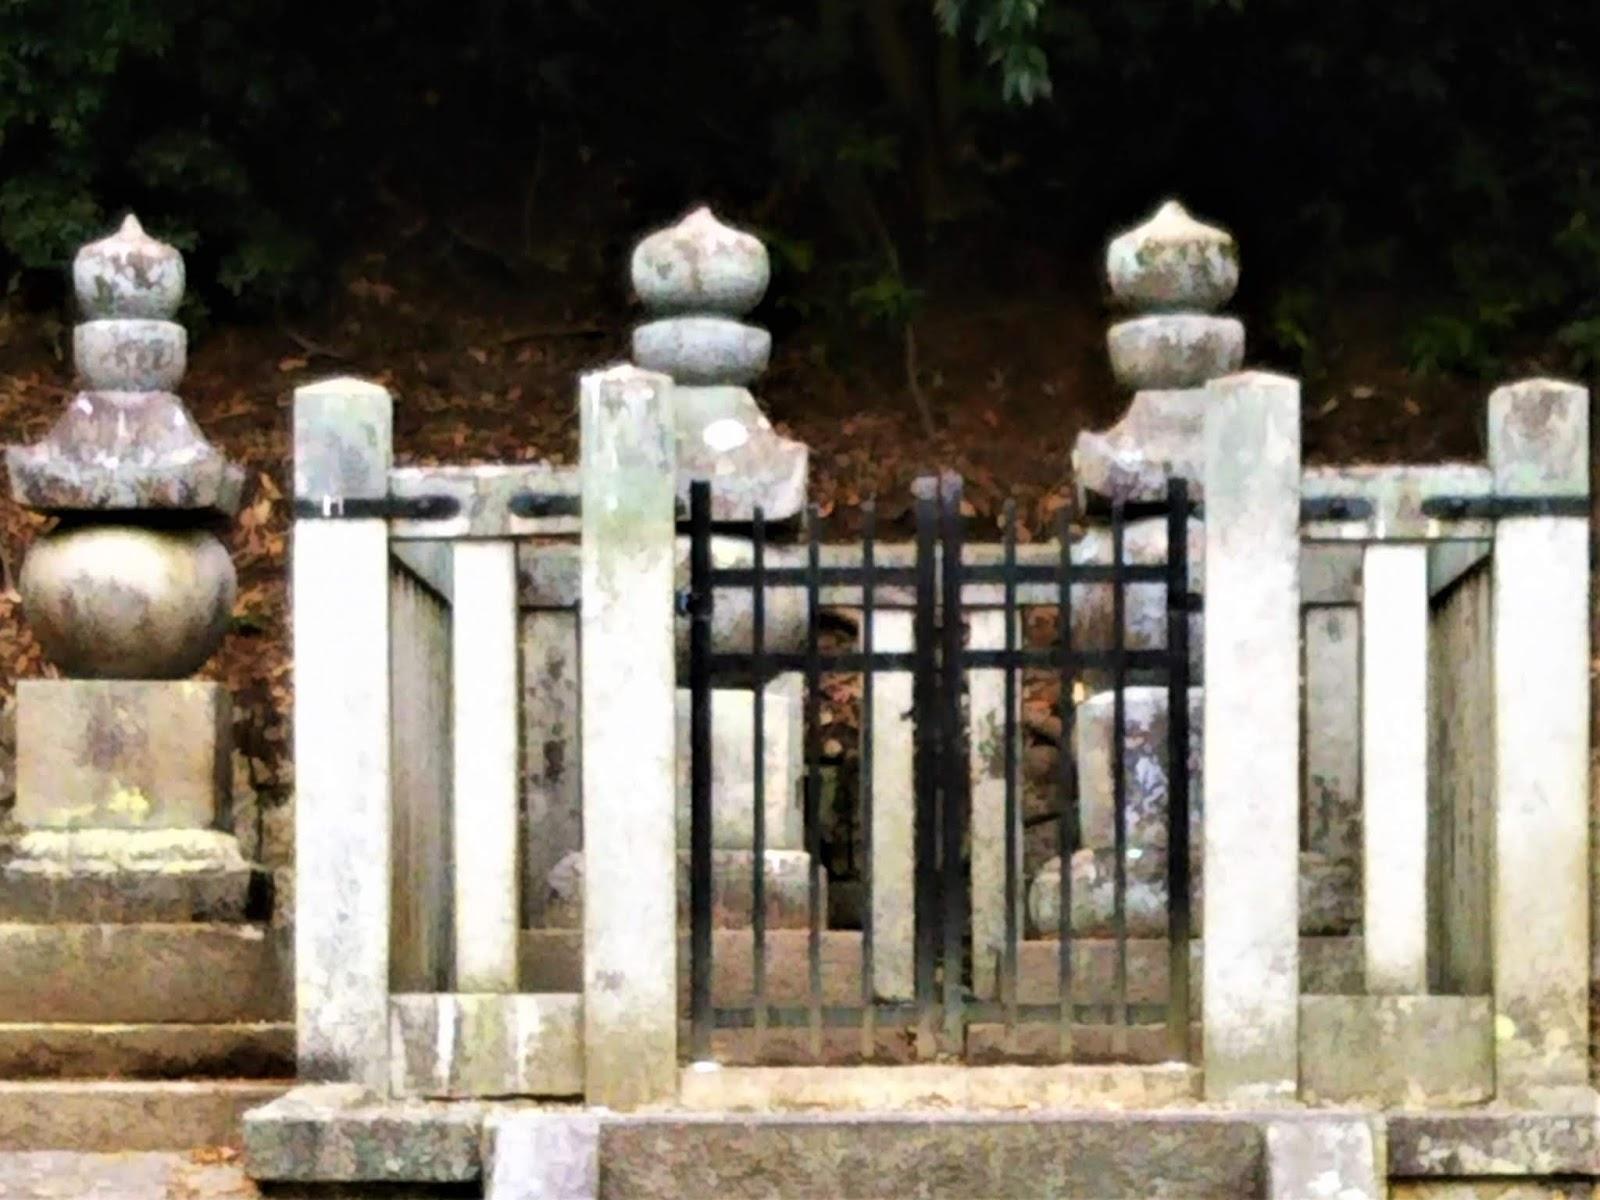 yamashirodayori: 天皇家は仏教...